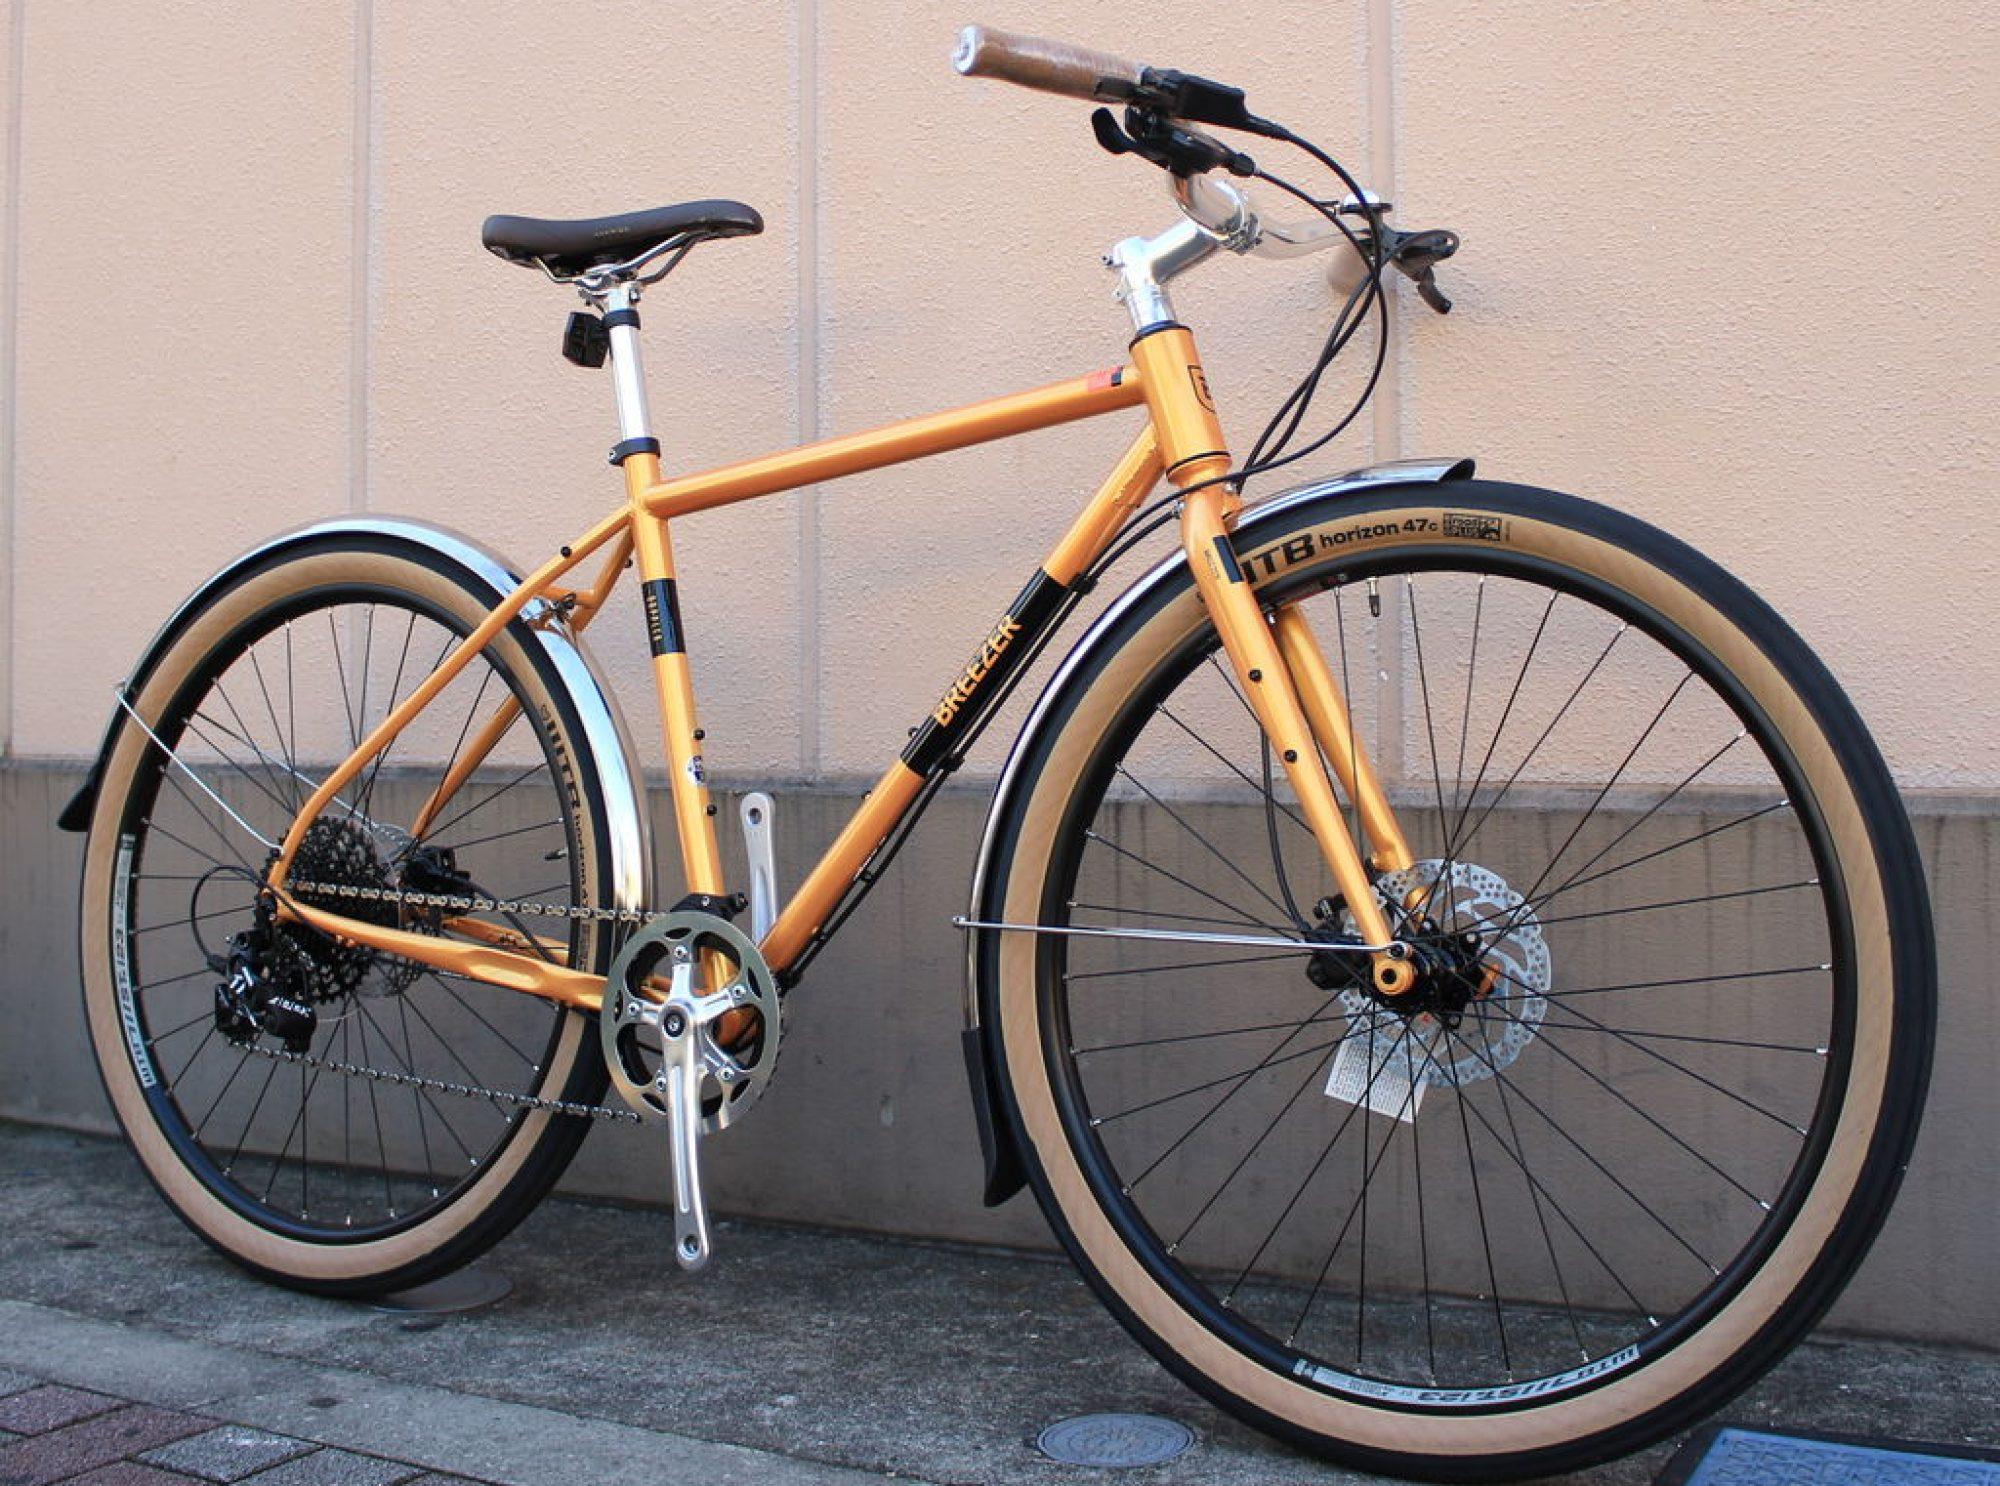 Deanos Bicycles